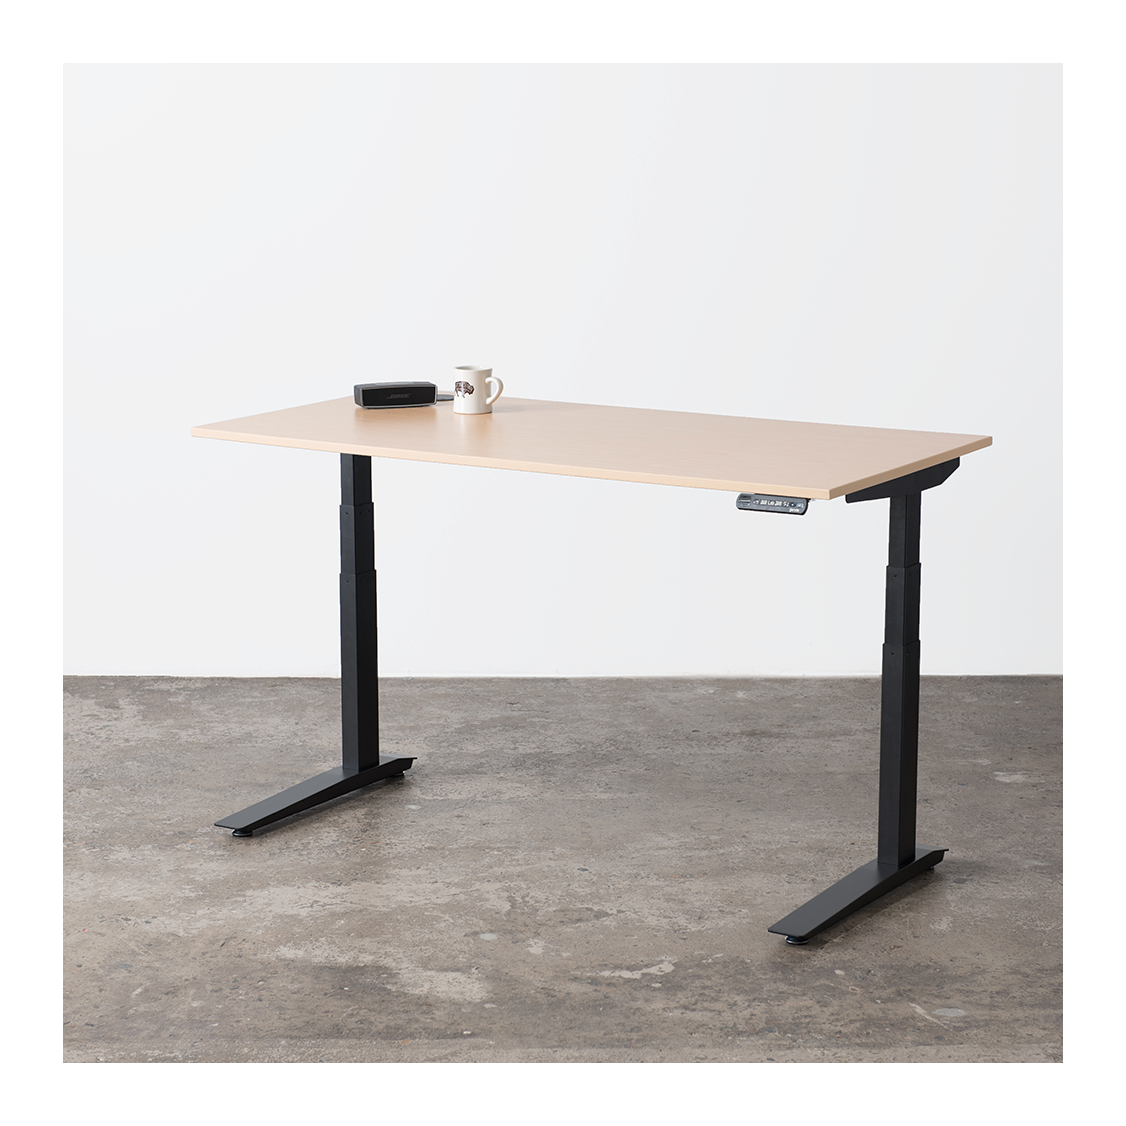 Merveilleux Jarvis Standing Desk   GREENGUARD Laminate (maple)   Fully